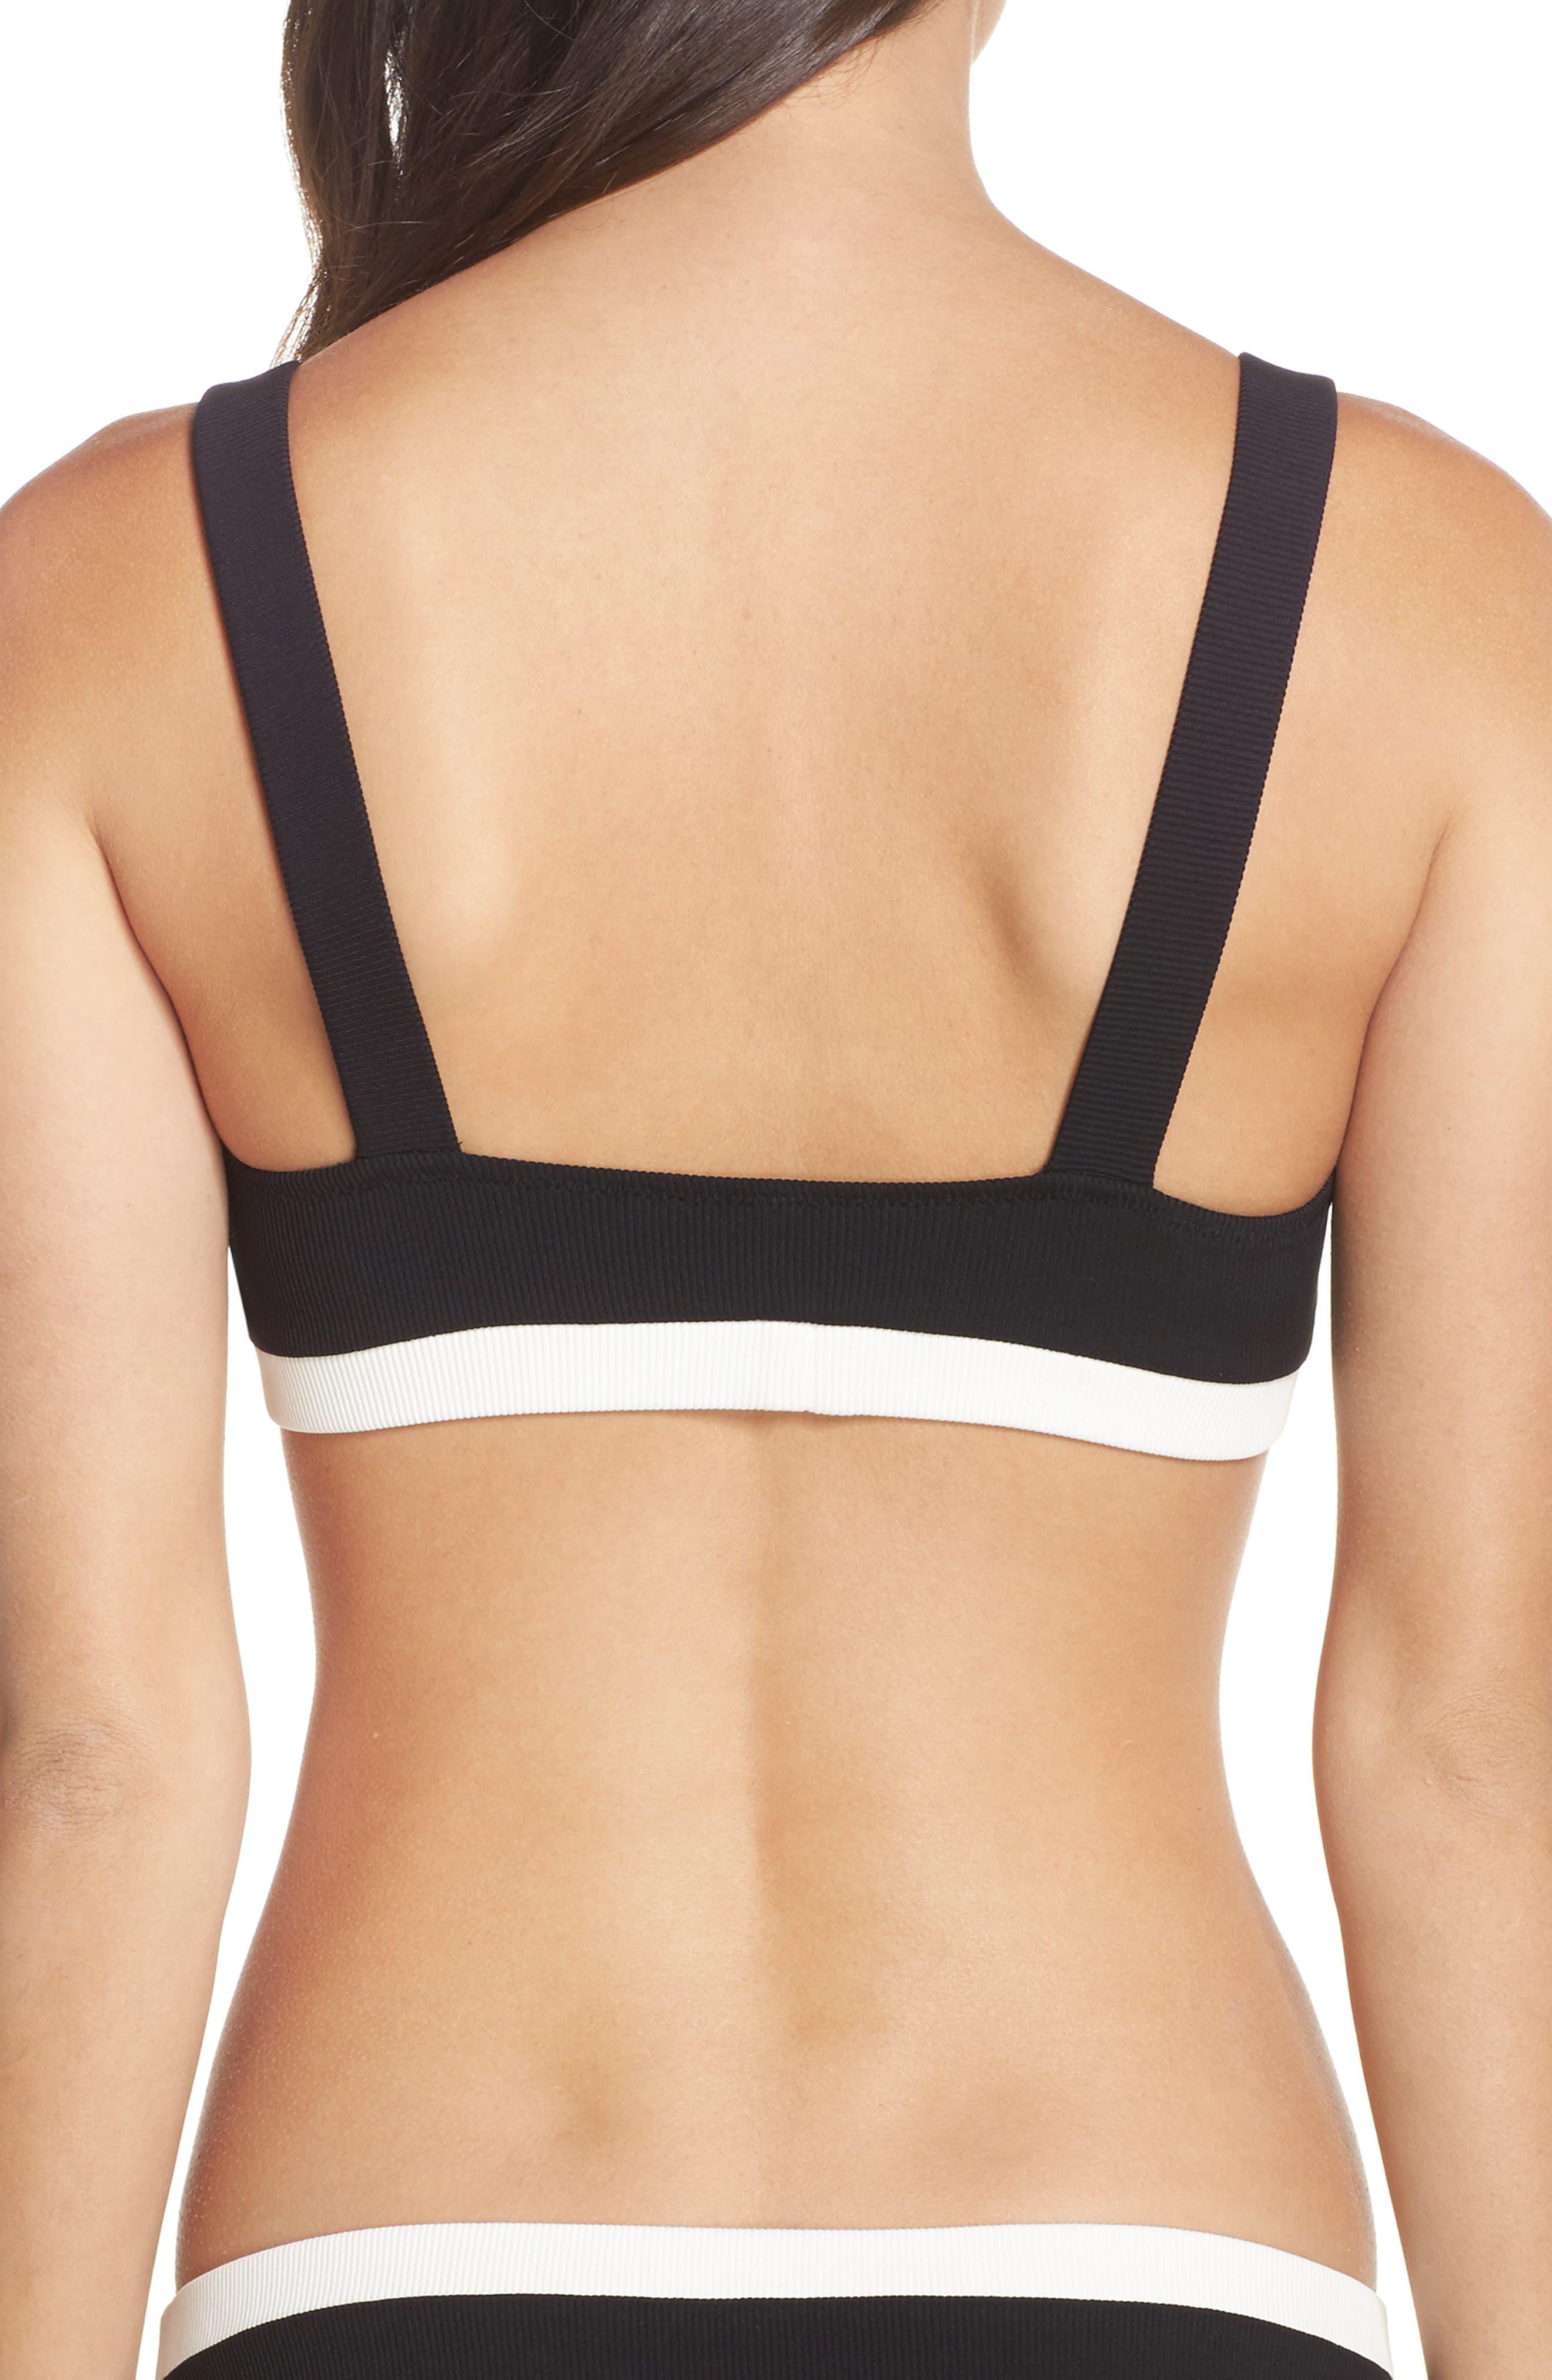 Alternate Image 2  - Solid & Striped The Madison Swim Top